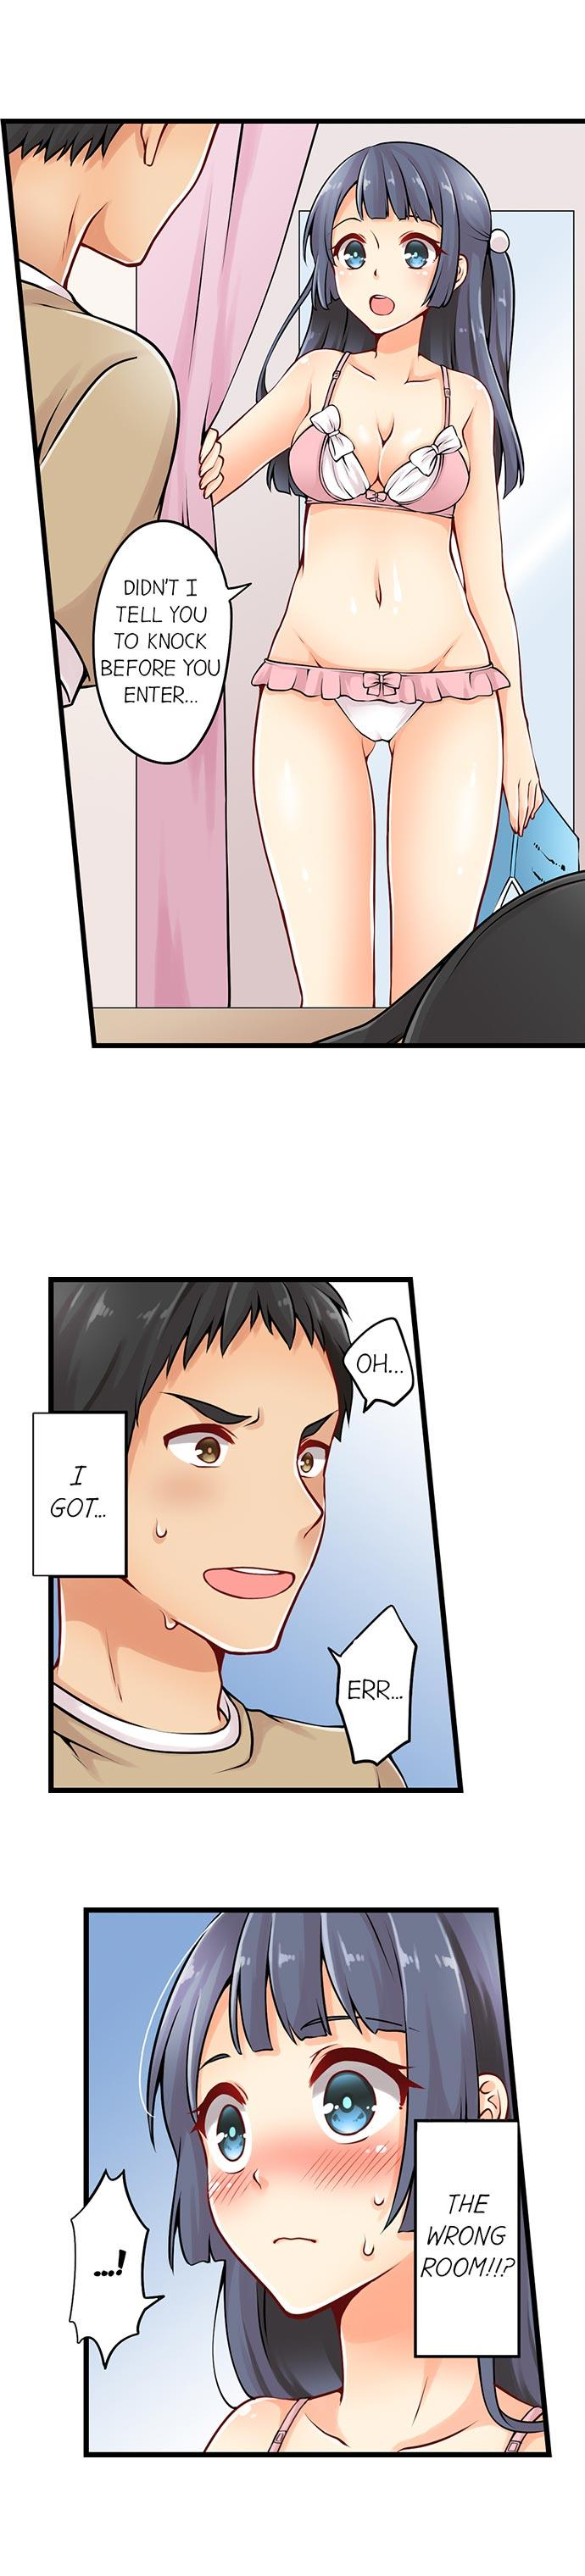 Ren Arisugawa Is Actually A Girl 93